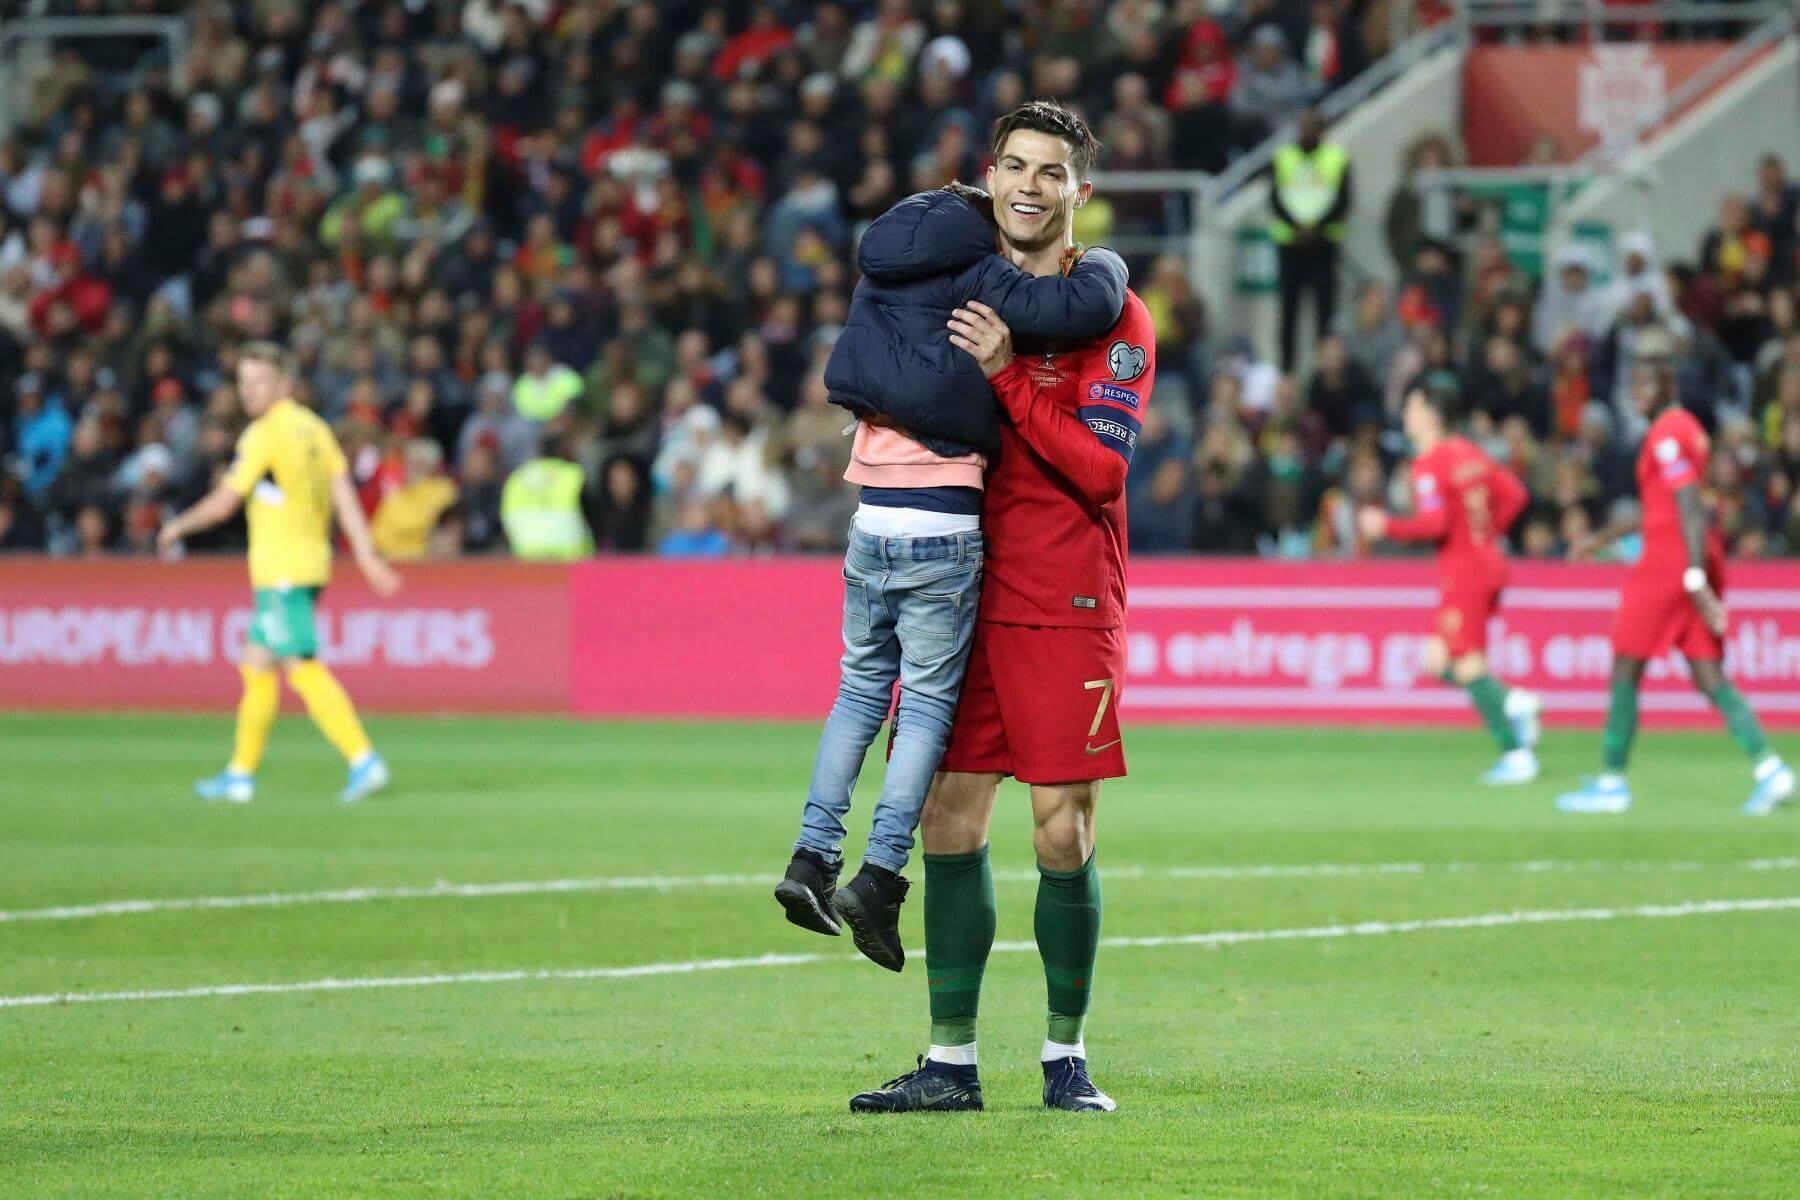 Portugalia vs Litwa Euro 2020